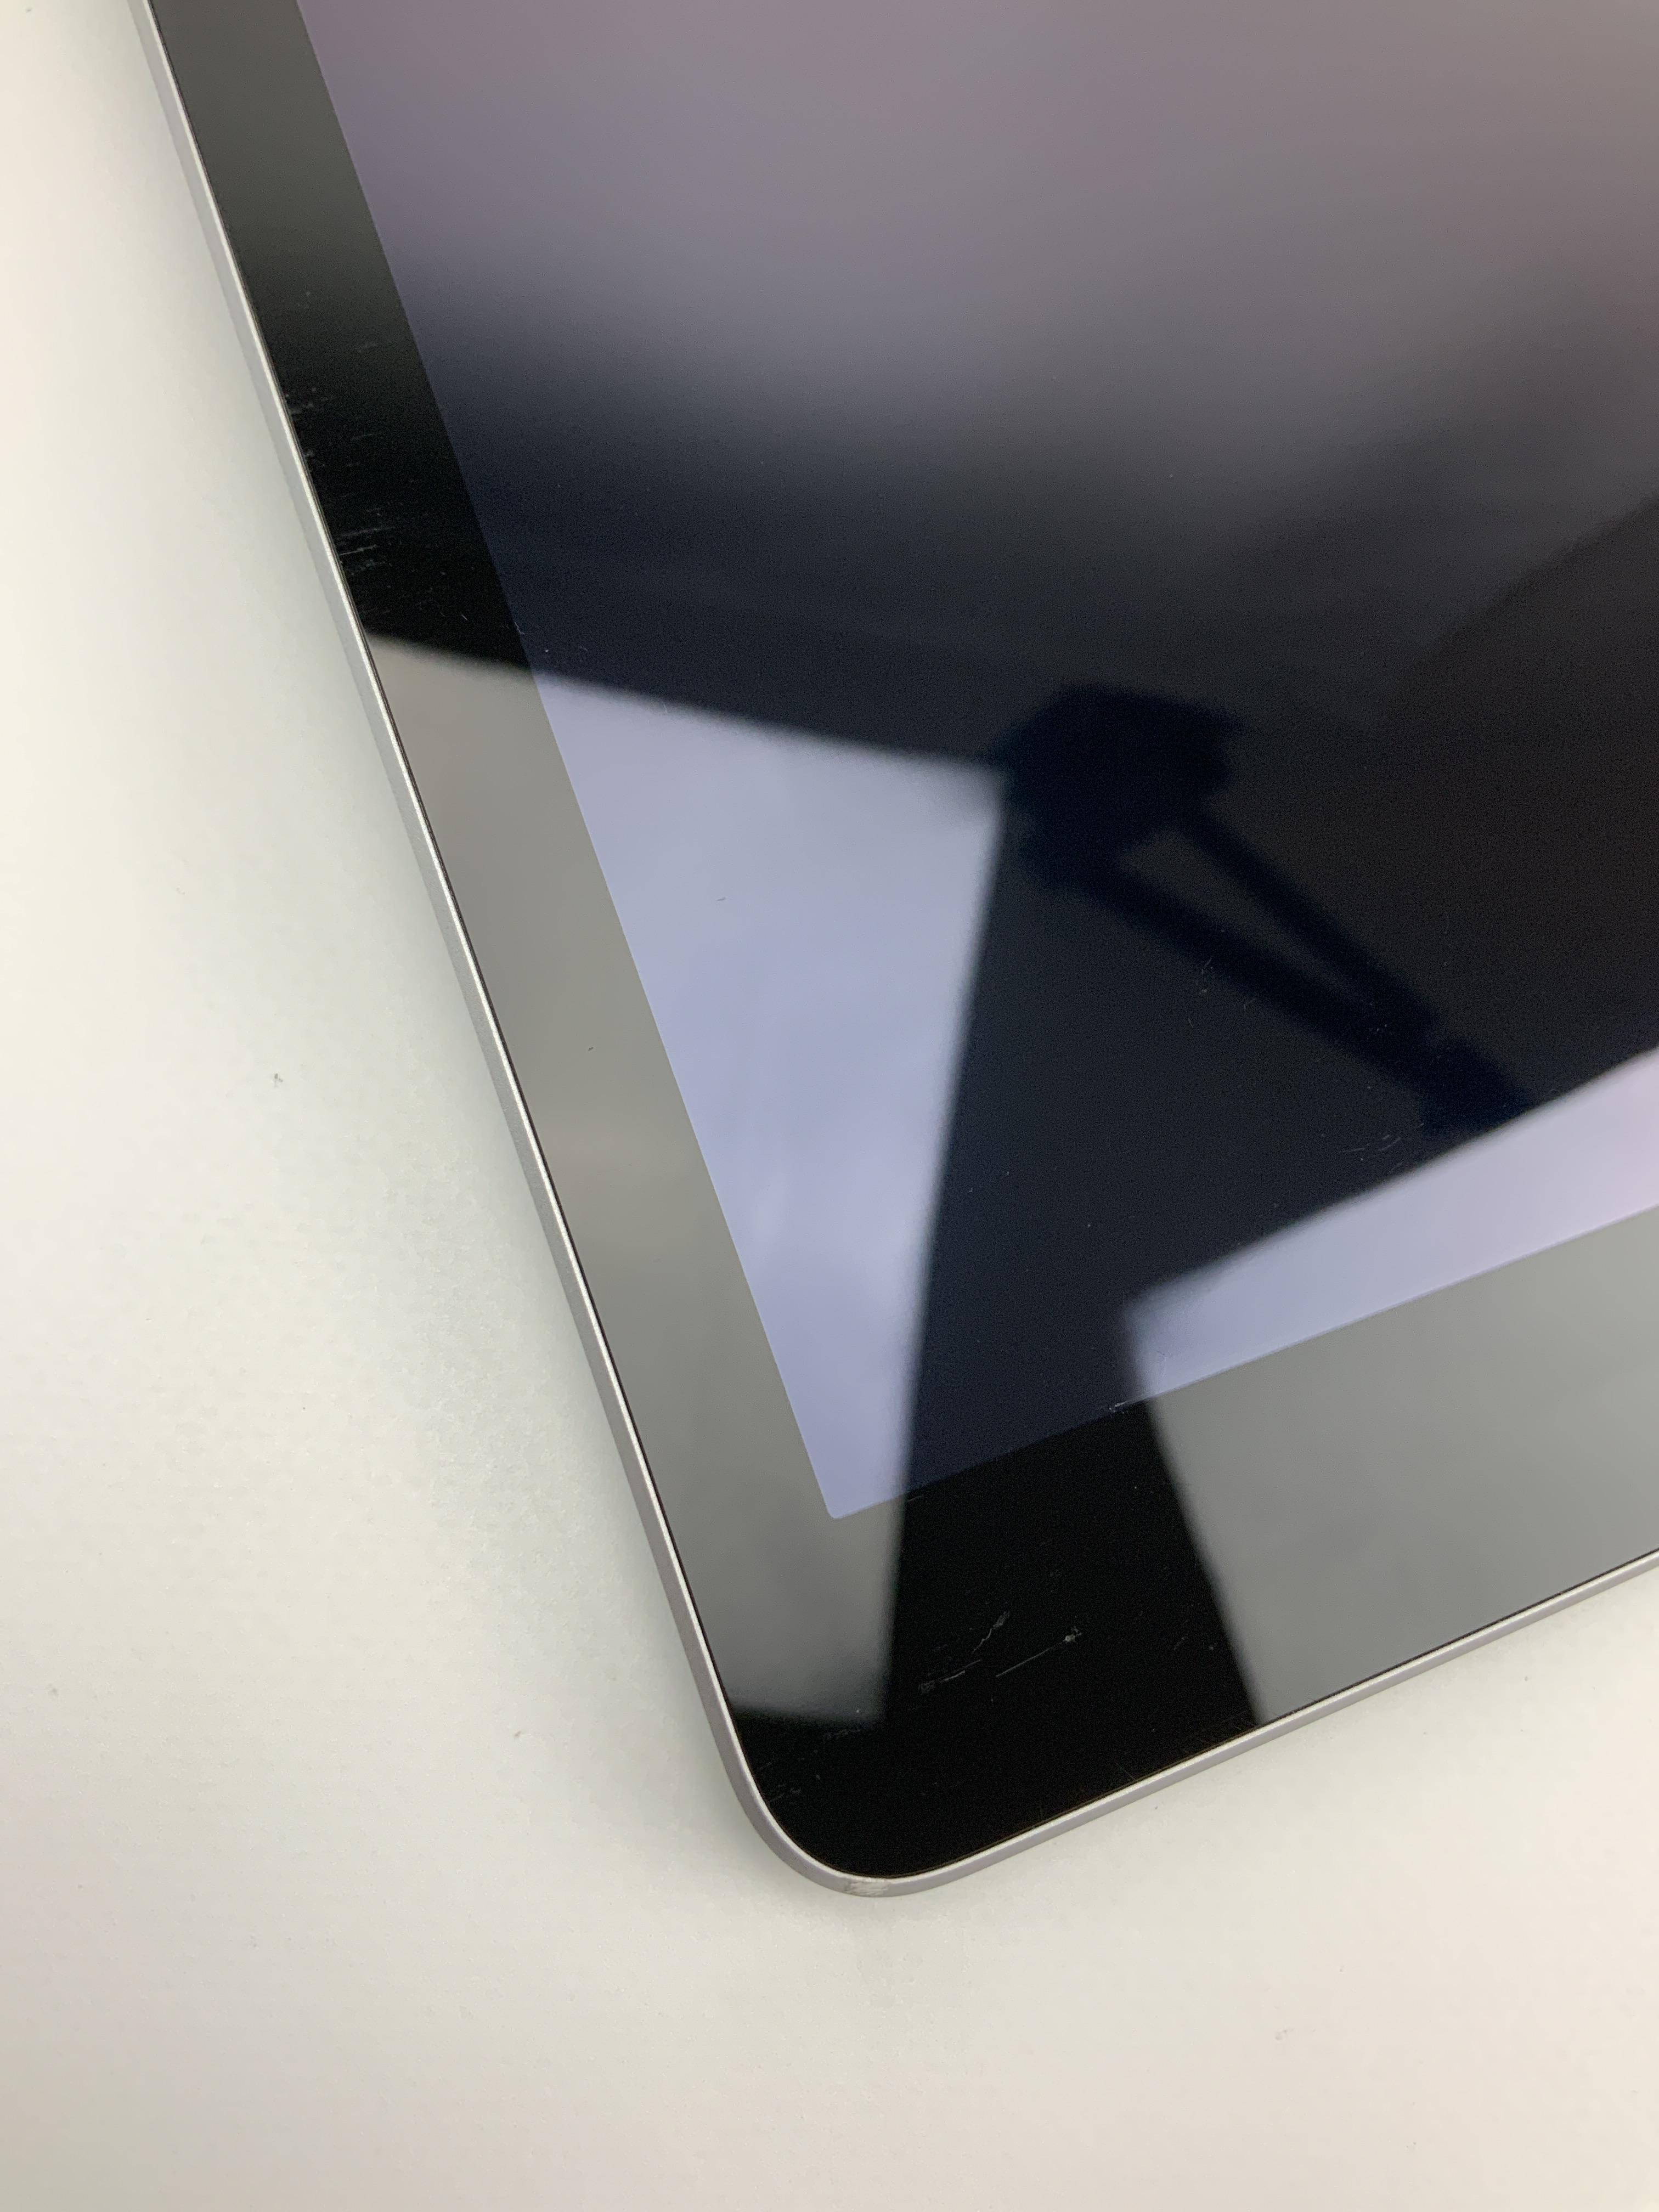 iPad 5 Wi-Fi + Cellular 32GB, 32GB, Space Gray, Bild 4